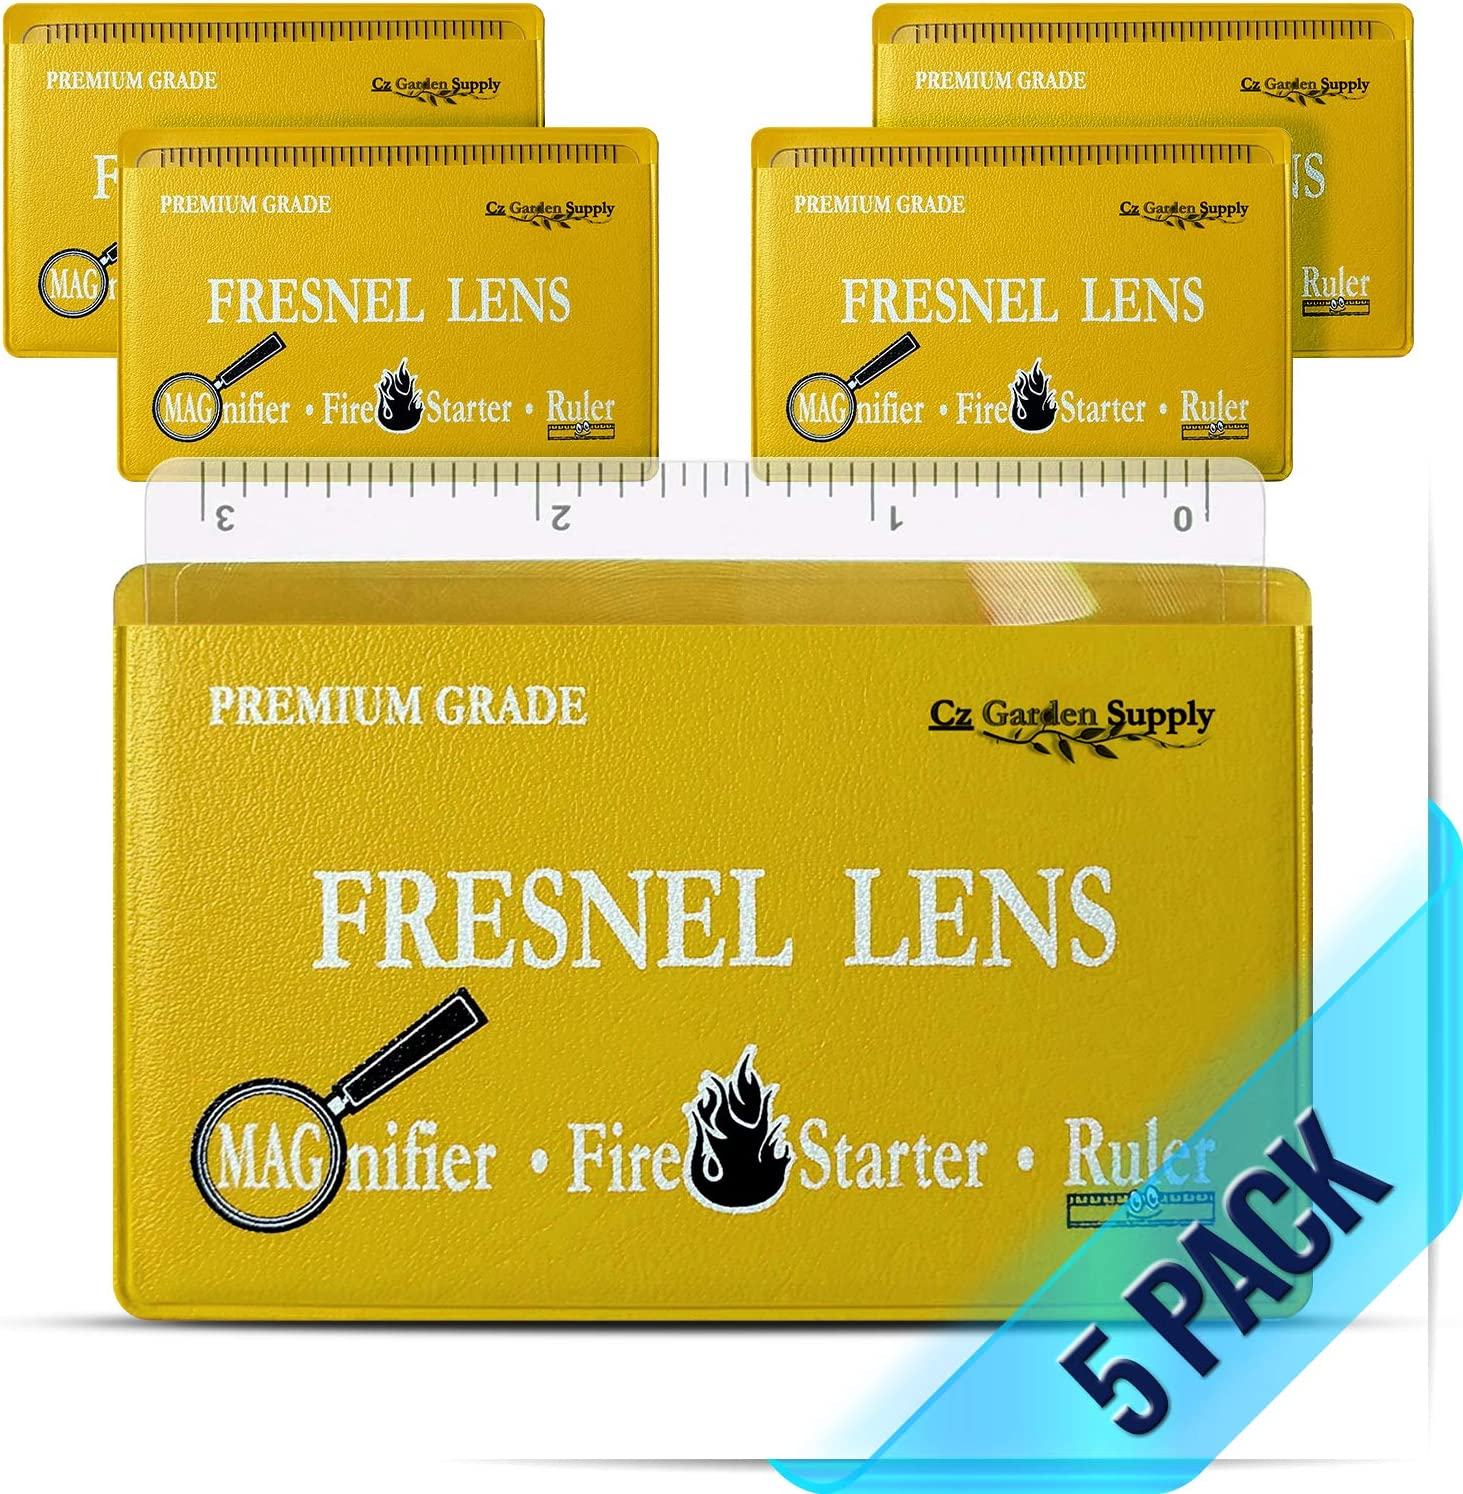 PREMIUM GRADE Fresnel Lens Pocket Wallet Credit Card Size - Magnifier - Solar Fire Starter - Ruler - UNBREAKABLE Plastic for Home Office Classroom & Outdoor EDC Survival Kit Bushcraft